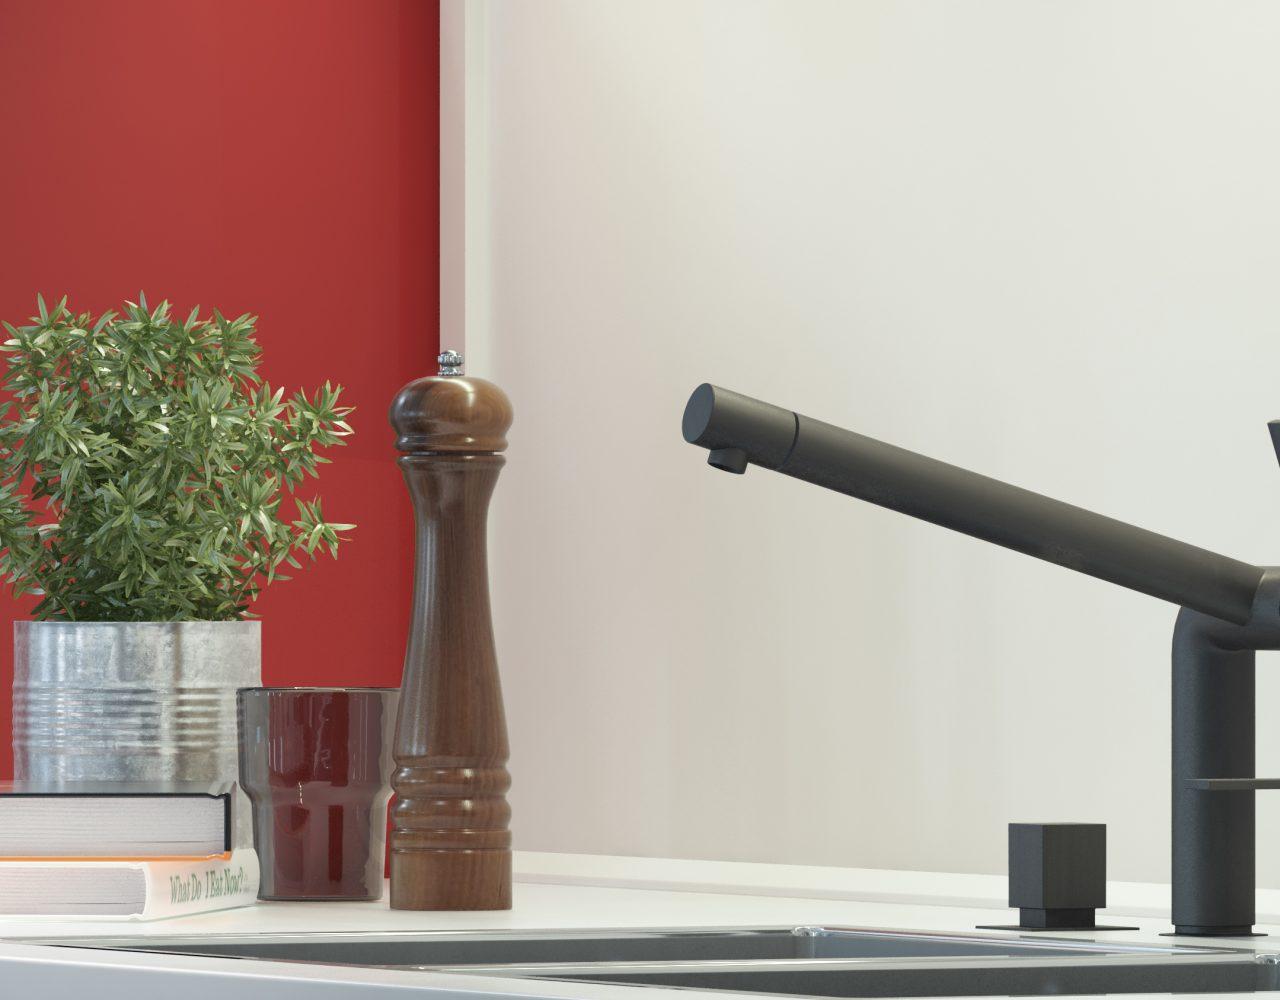 hrz-110-industrial-design